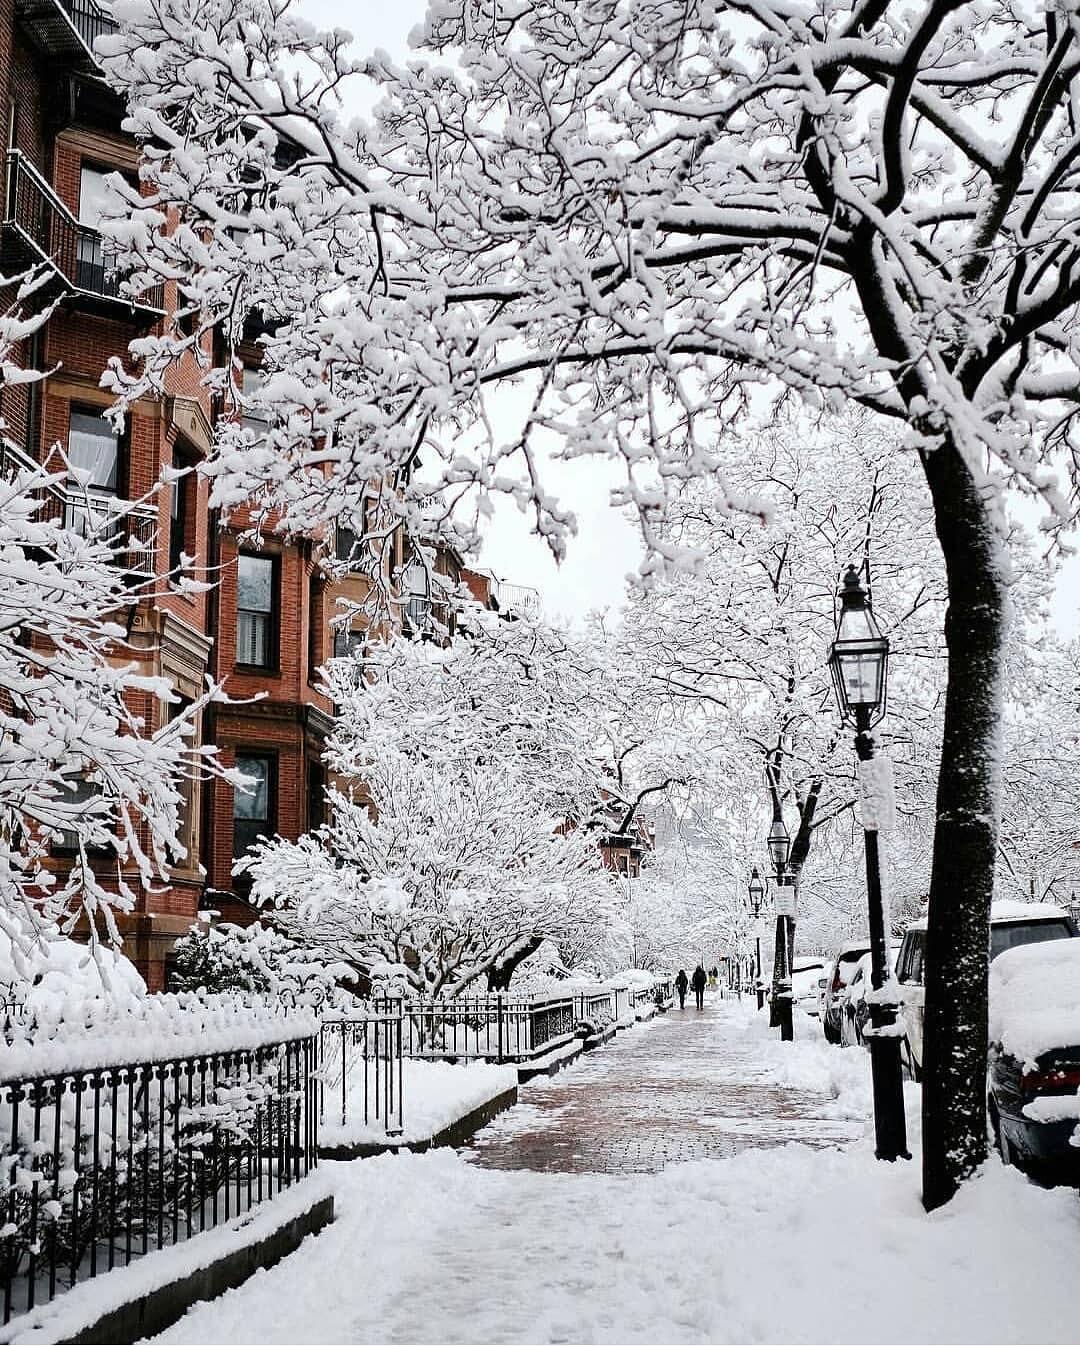 Winter Portrait Boston Massachusetts United States Photo By Kimmyn Winter Scenery Winter Images Winter Wallpaper